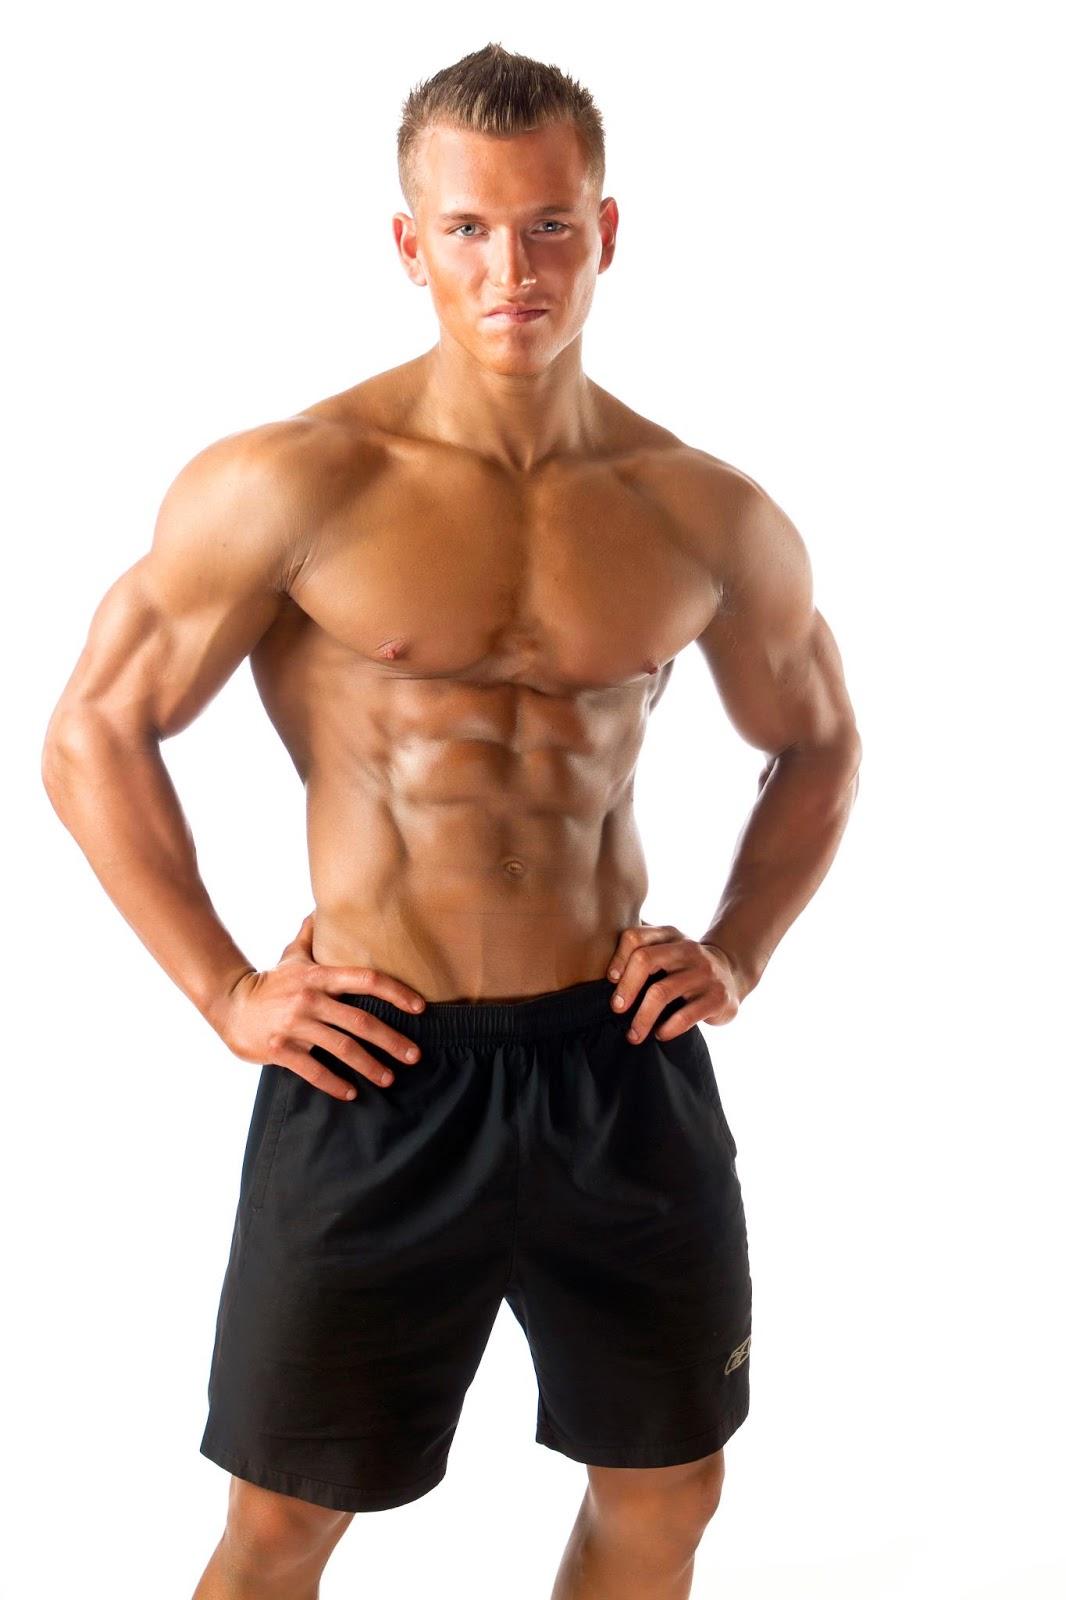 sameul dixon shredded male aesthetic physiques